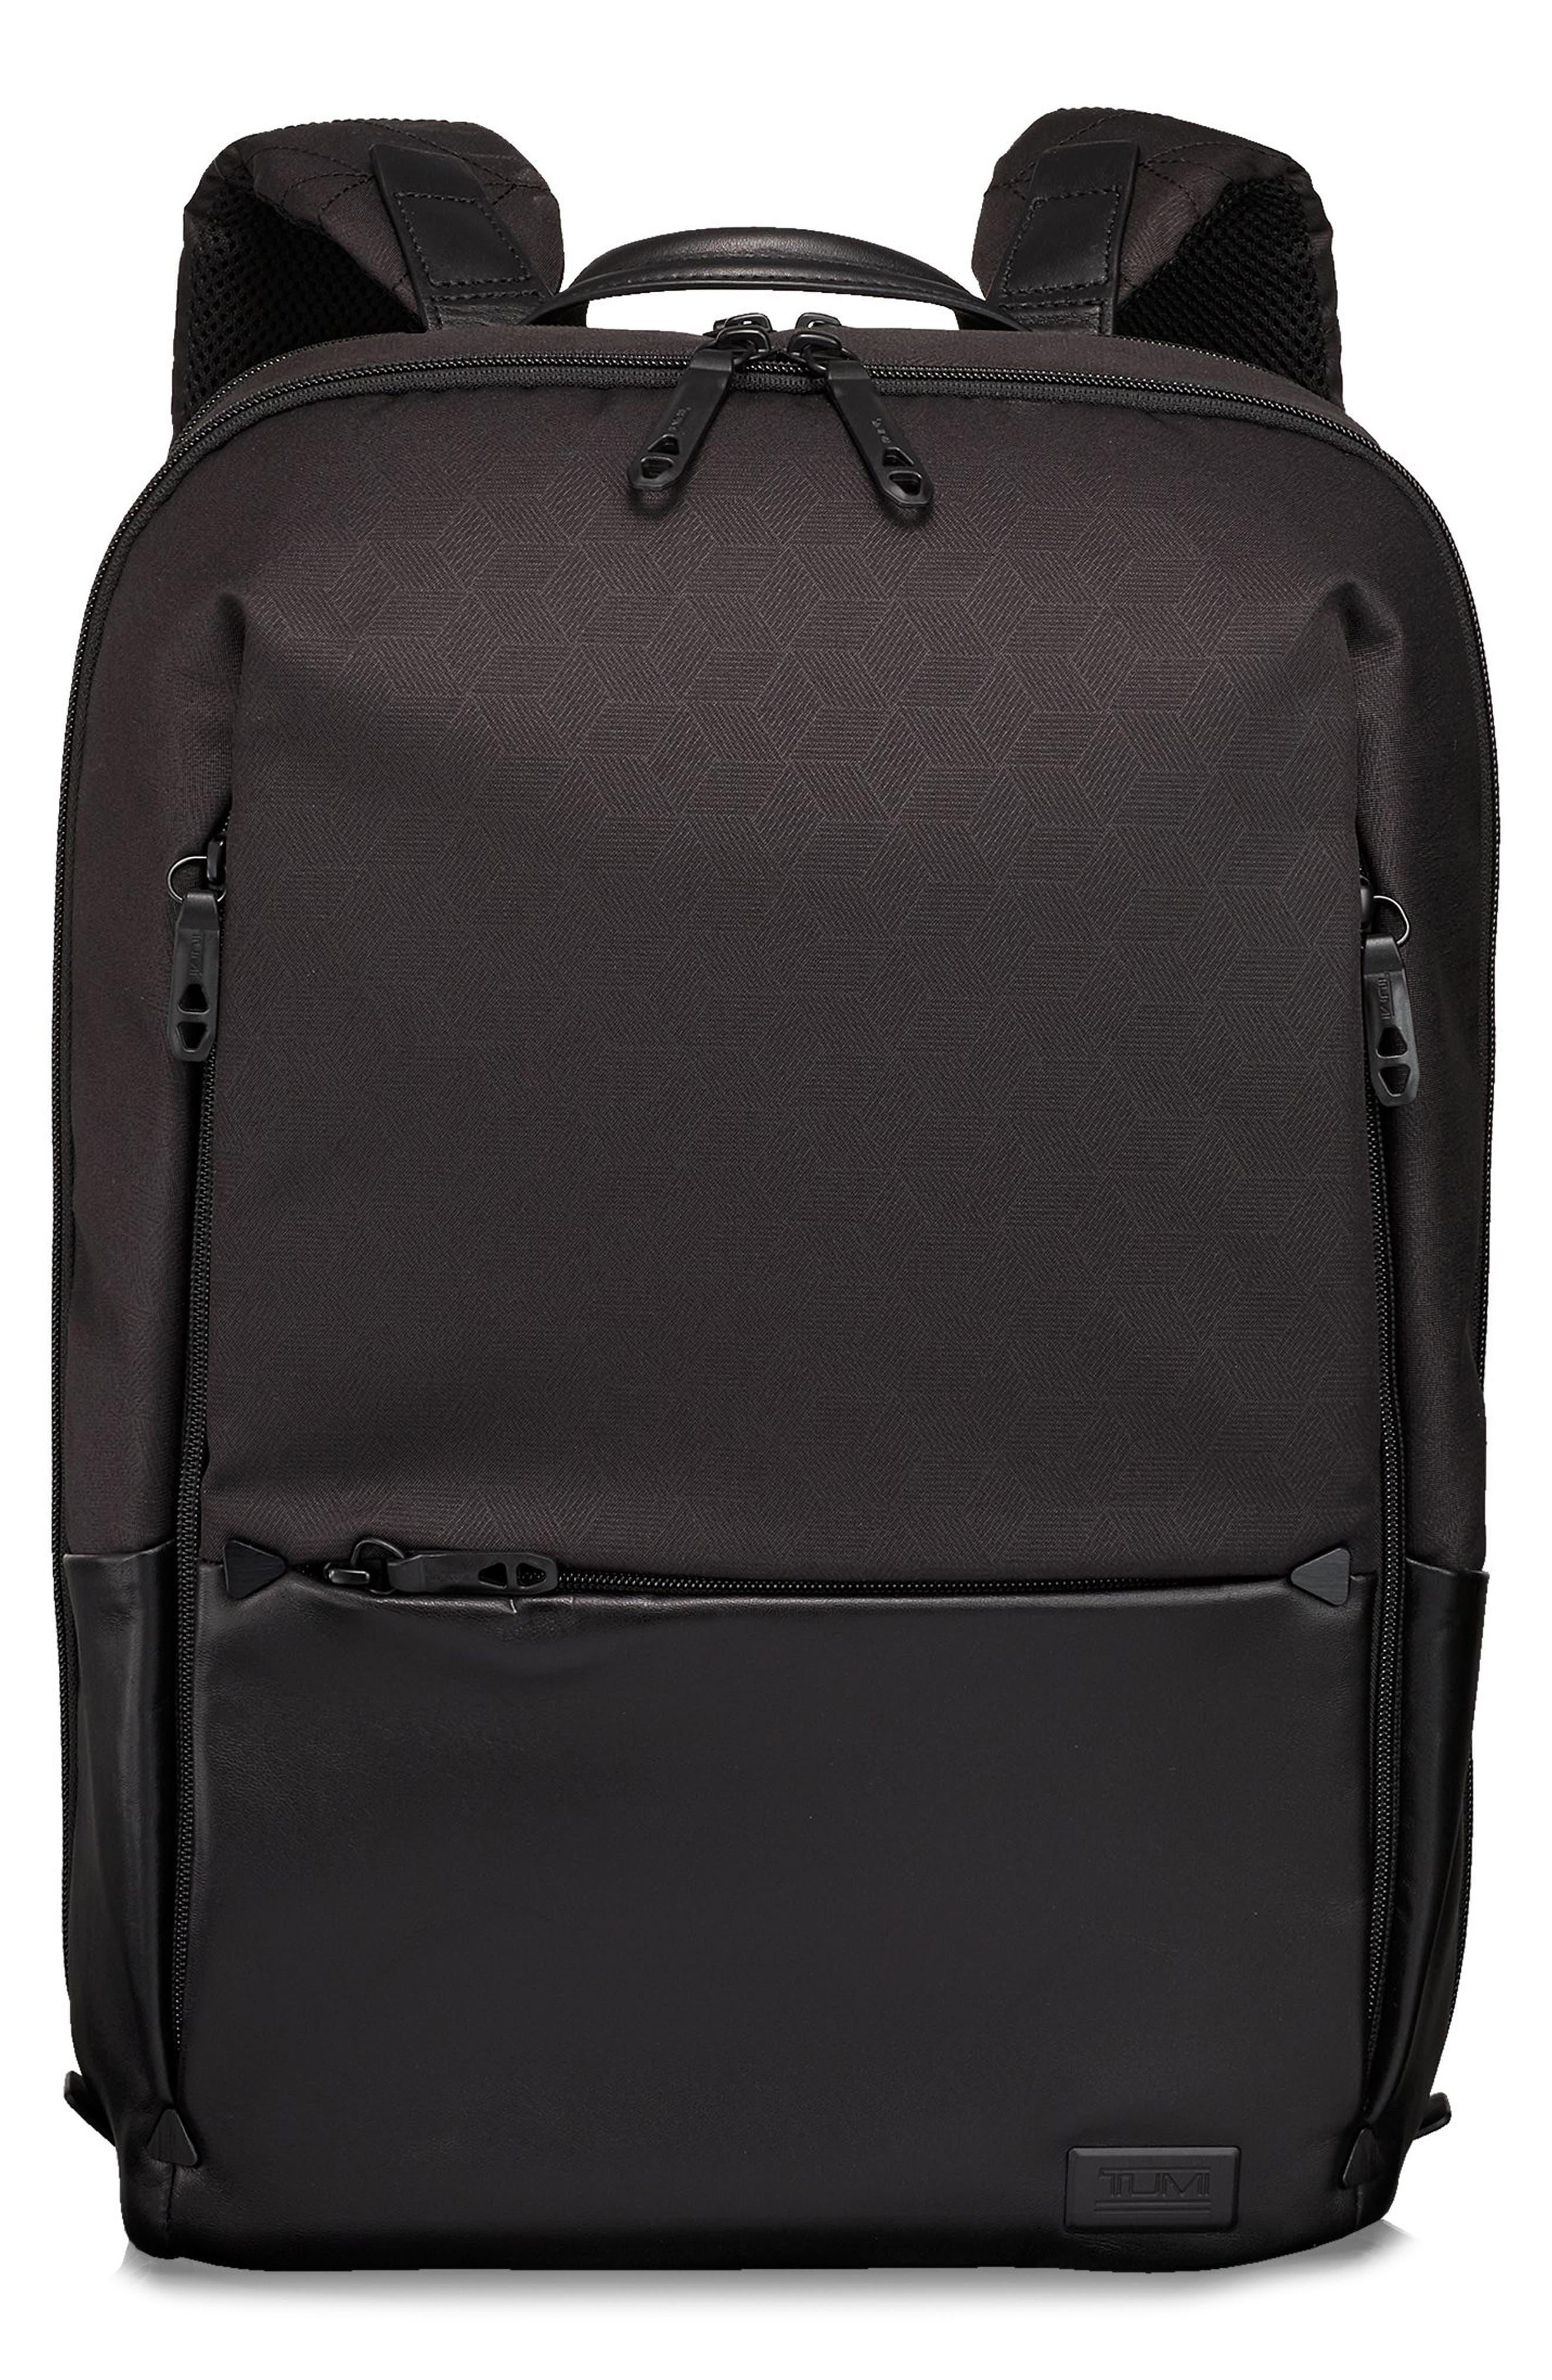 Butler Backpack,                         Main,                         color,